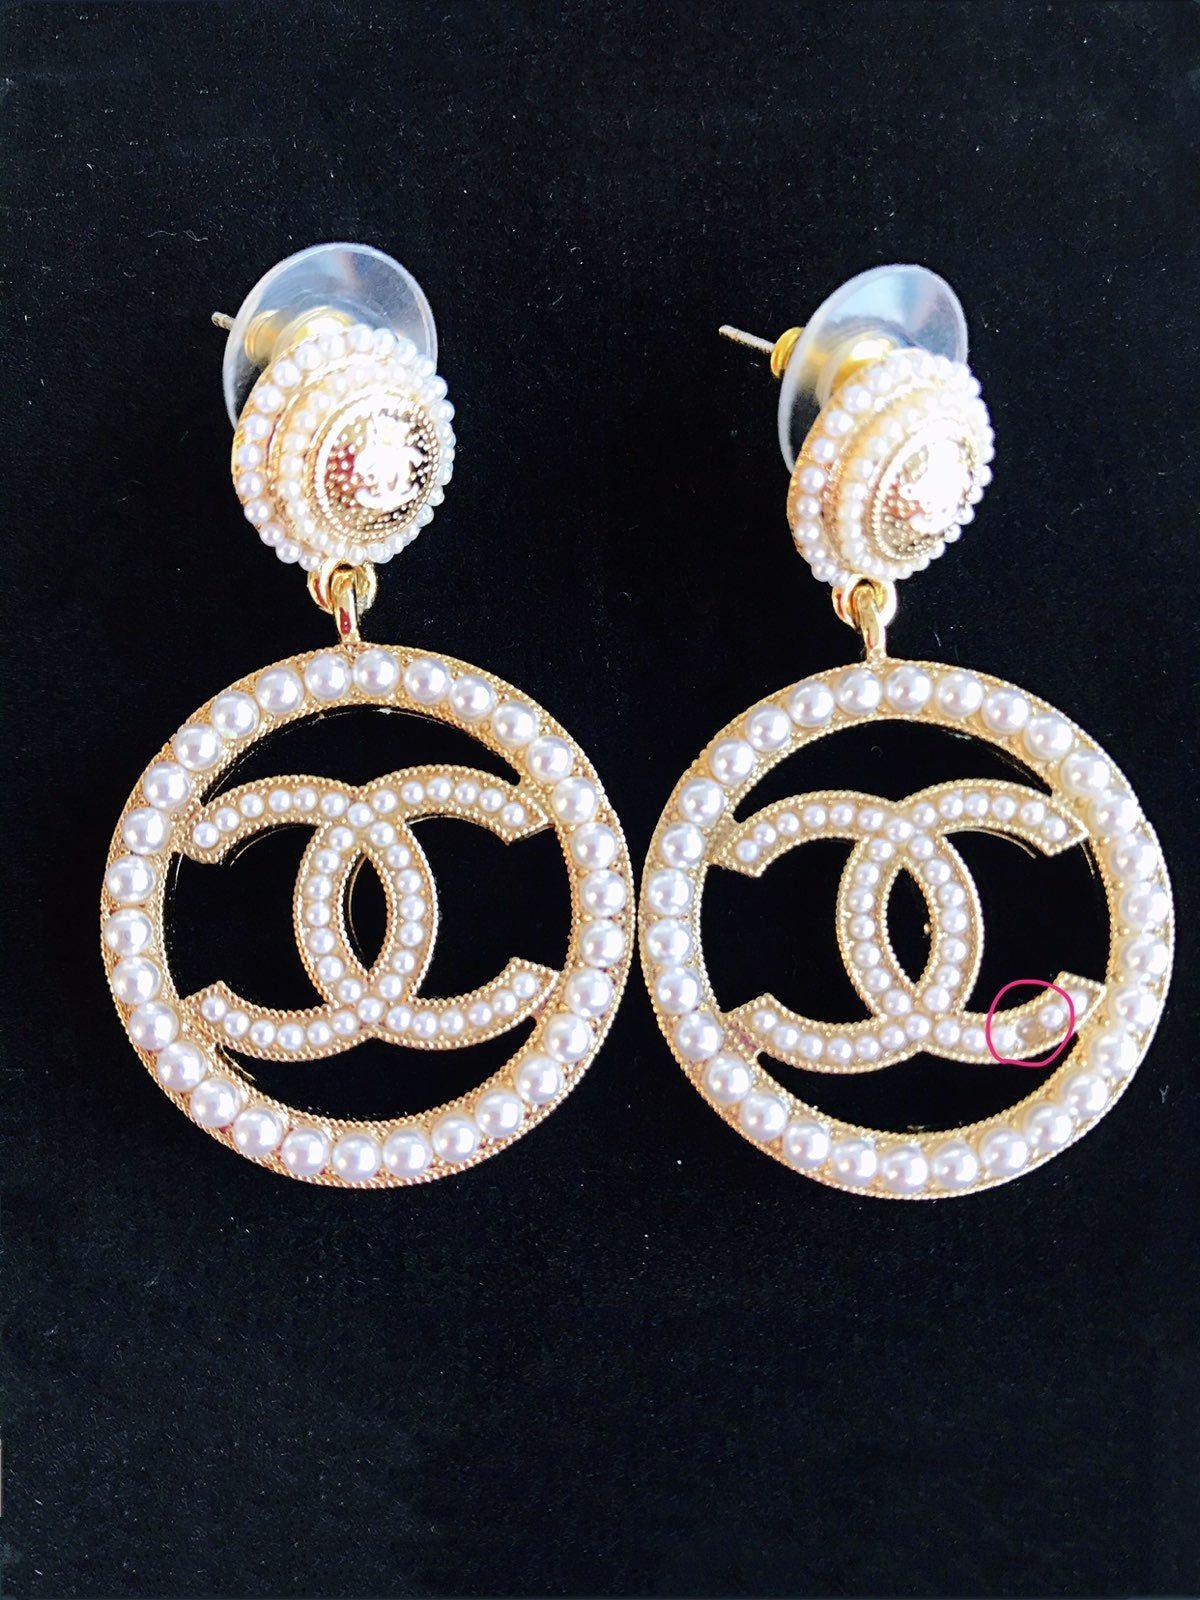 Authentic beautiful Chanel pearl CC logo earrings